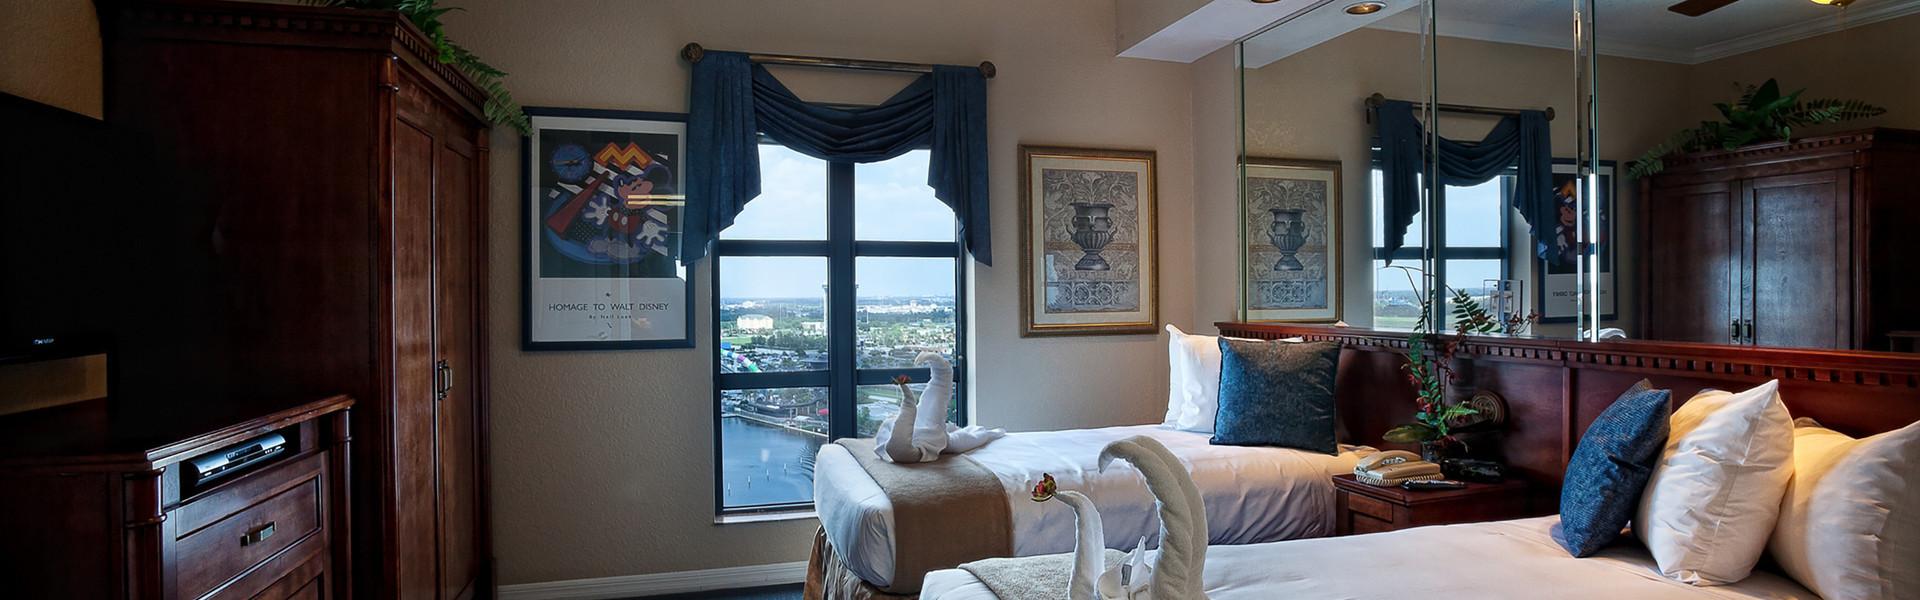 2 Bedroom Resorts in Orlando FL   Resorts Near I Drive Orlando, FL 32819   Westgate Palace Resort